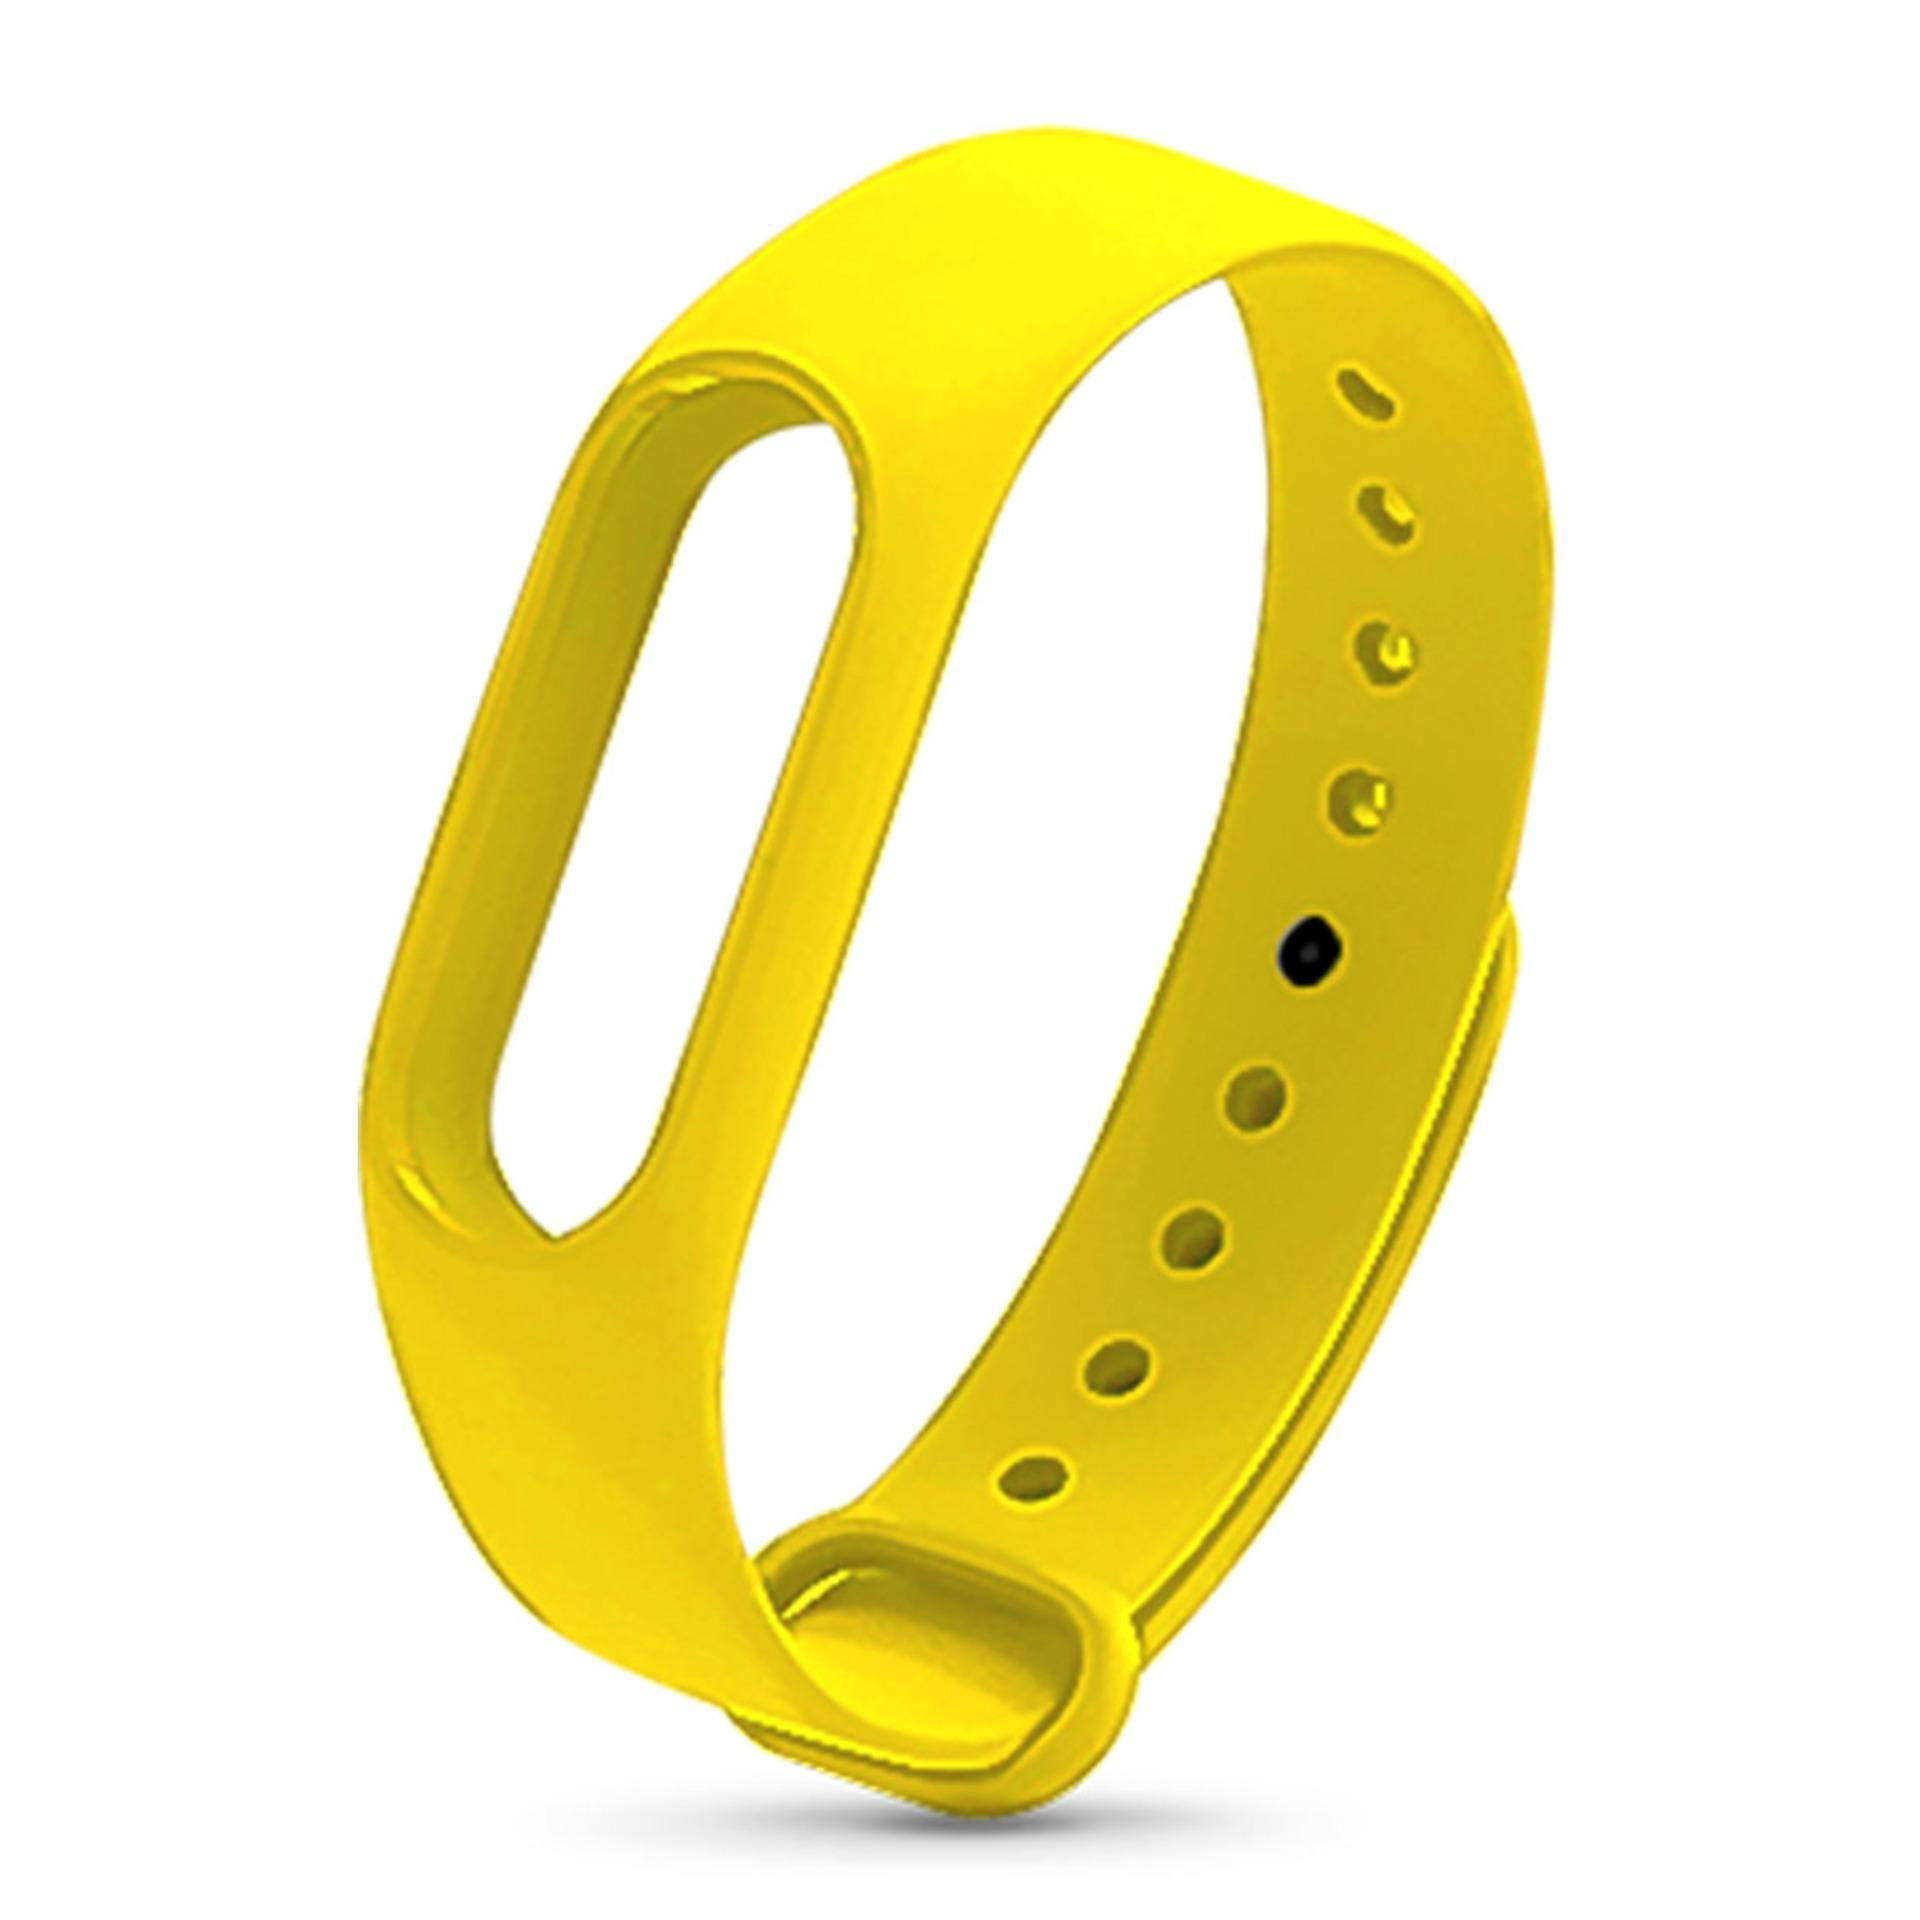 Xiaomi Mi Band 2 Replacement Jelly Watch Band Wrist Strap (yellow) By Hellotronics.